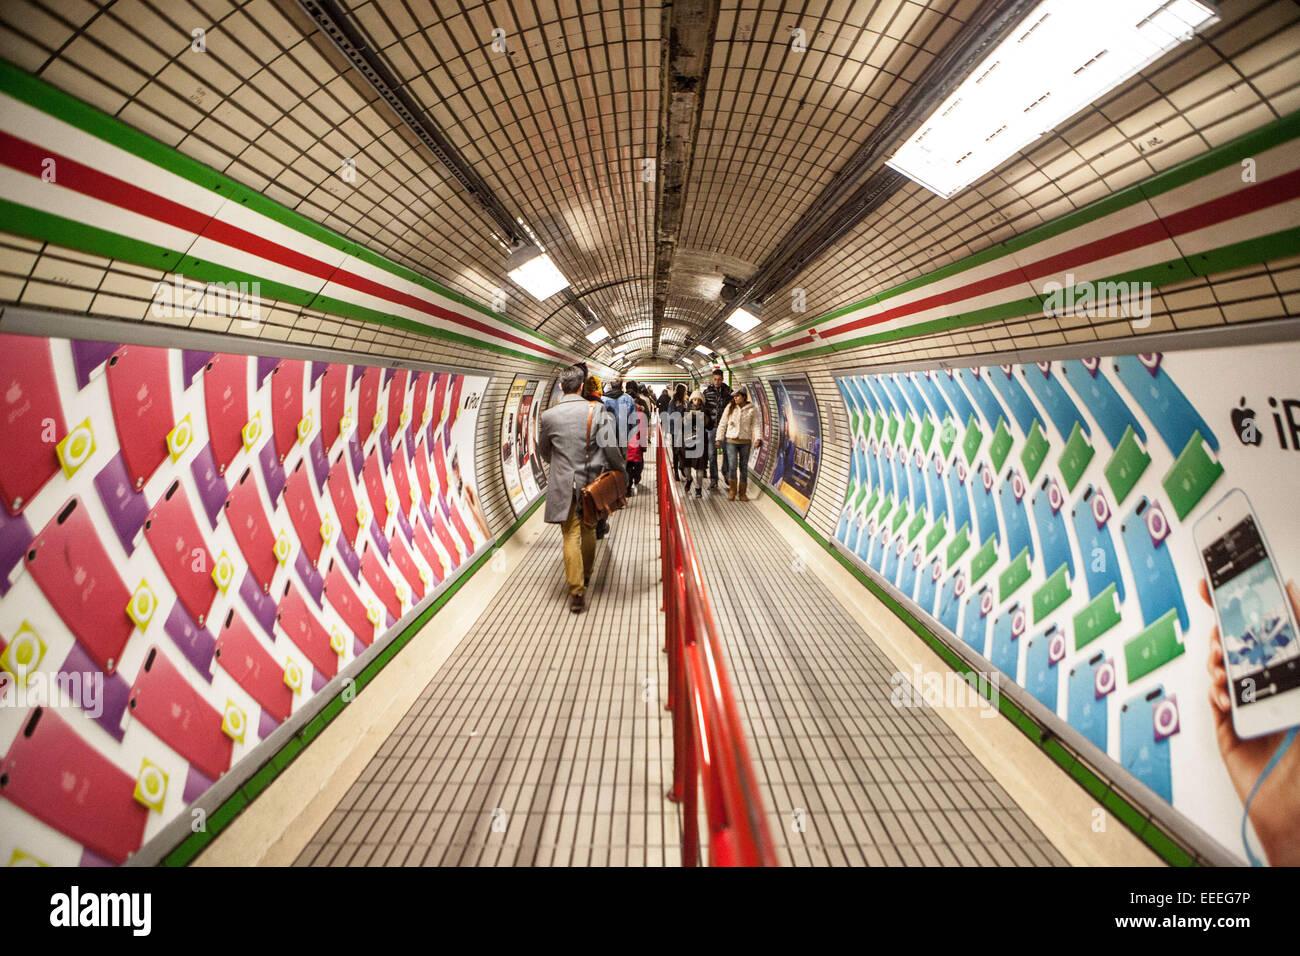 Weg zur Central Line Plattformen aus den Eingang Rolltreppen bei Tottenham Court Road Station. Stockbild